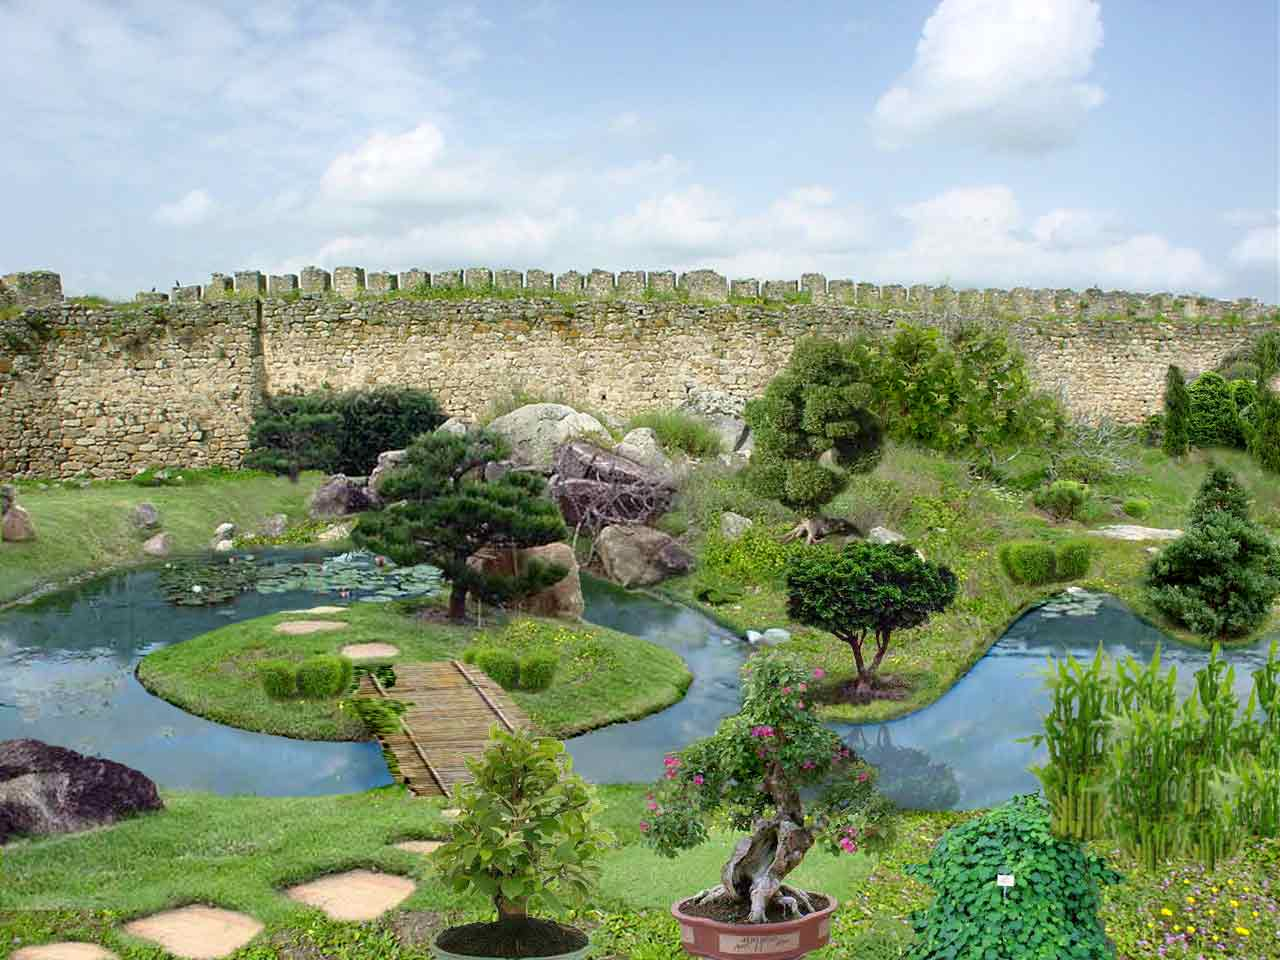 Jardin botanico de trujillo for Parques con jardines